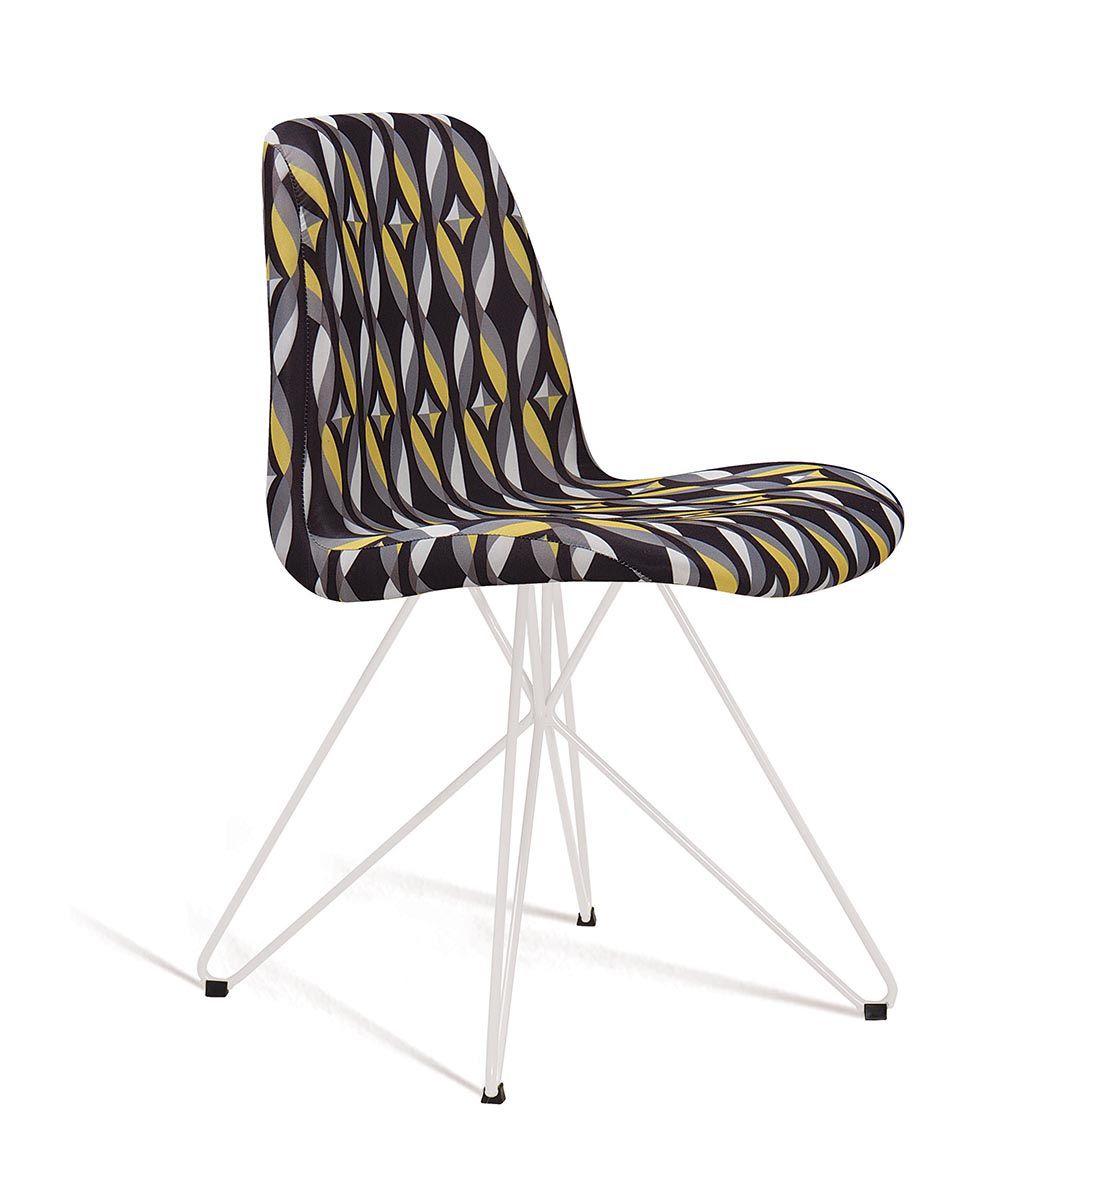 Cadeira Eames Butterfly Color Preto Base Branca Tecido Suede DAF